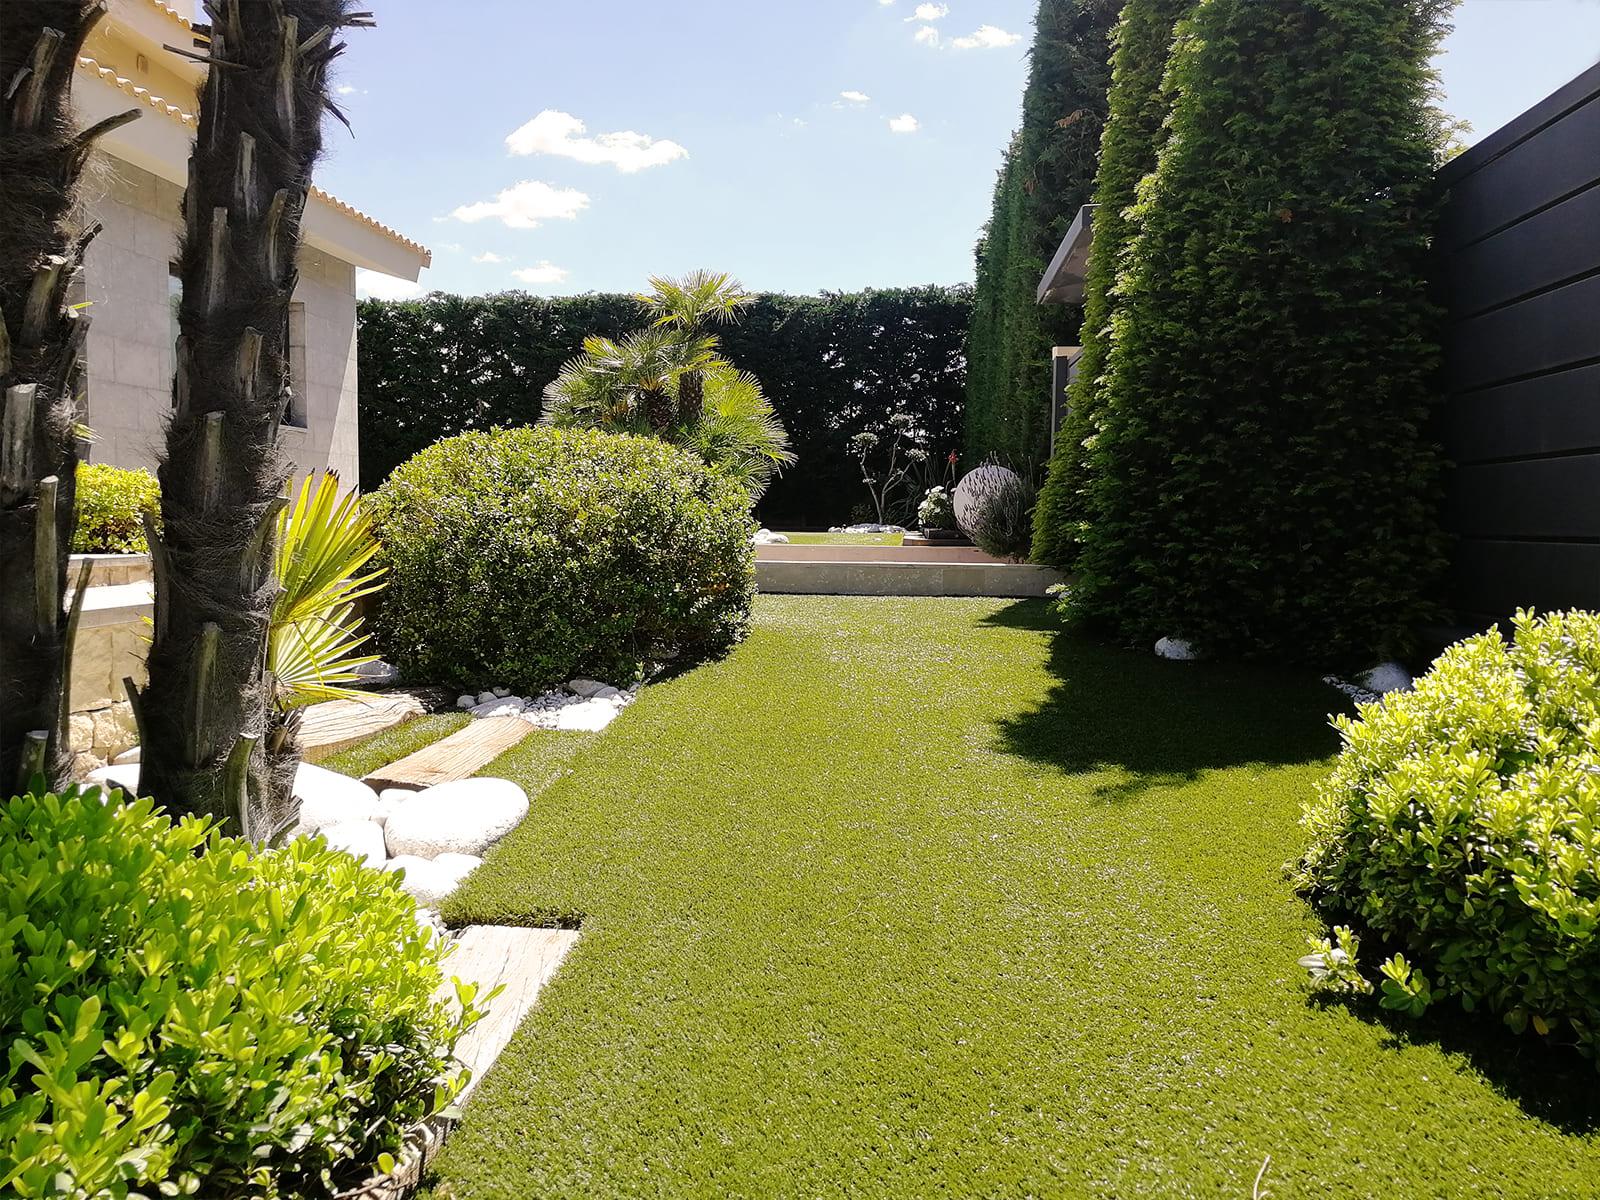 diseño-jardines-piscina-solarium-madera-IJ-03_HIDROJARDIN-Bañeres.jpg